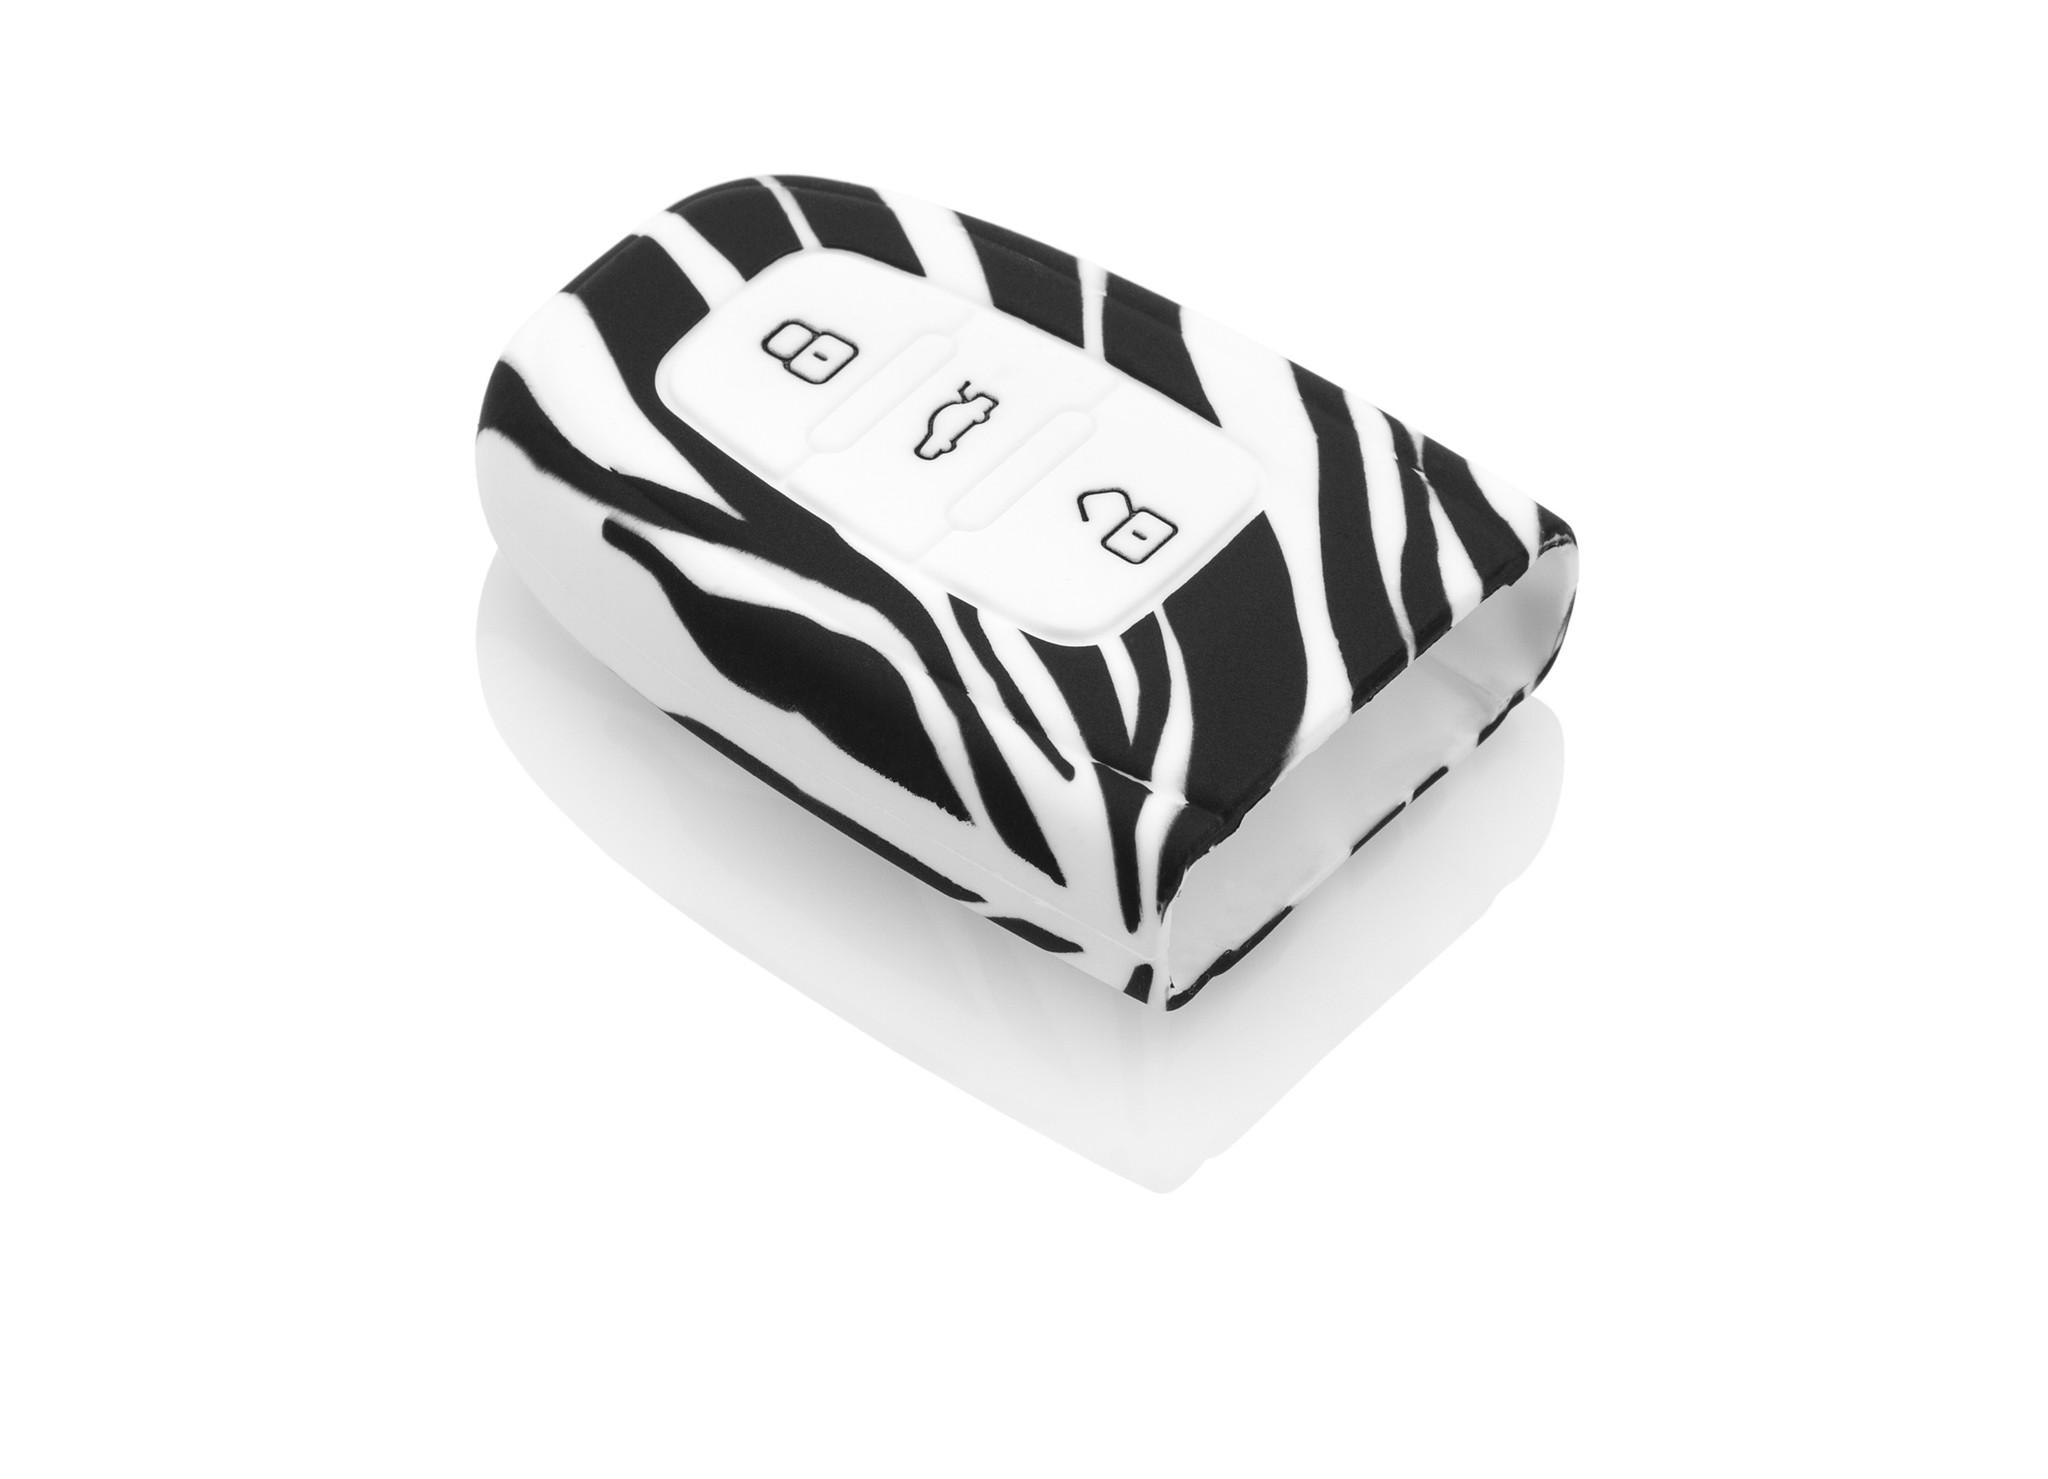 TBU car Autoschlüssel Hülle für Audi 3 Tasten (Keyless Entry) - Schutzhülle aus Silikon - Auto Schlüsselhülle Cover in Zebra